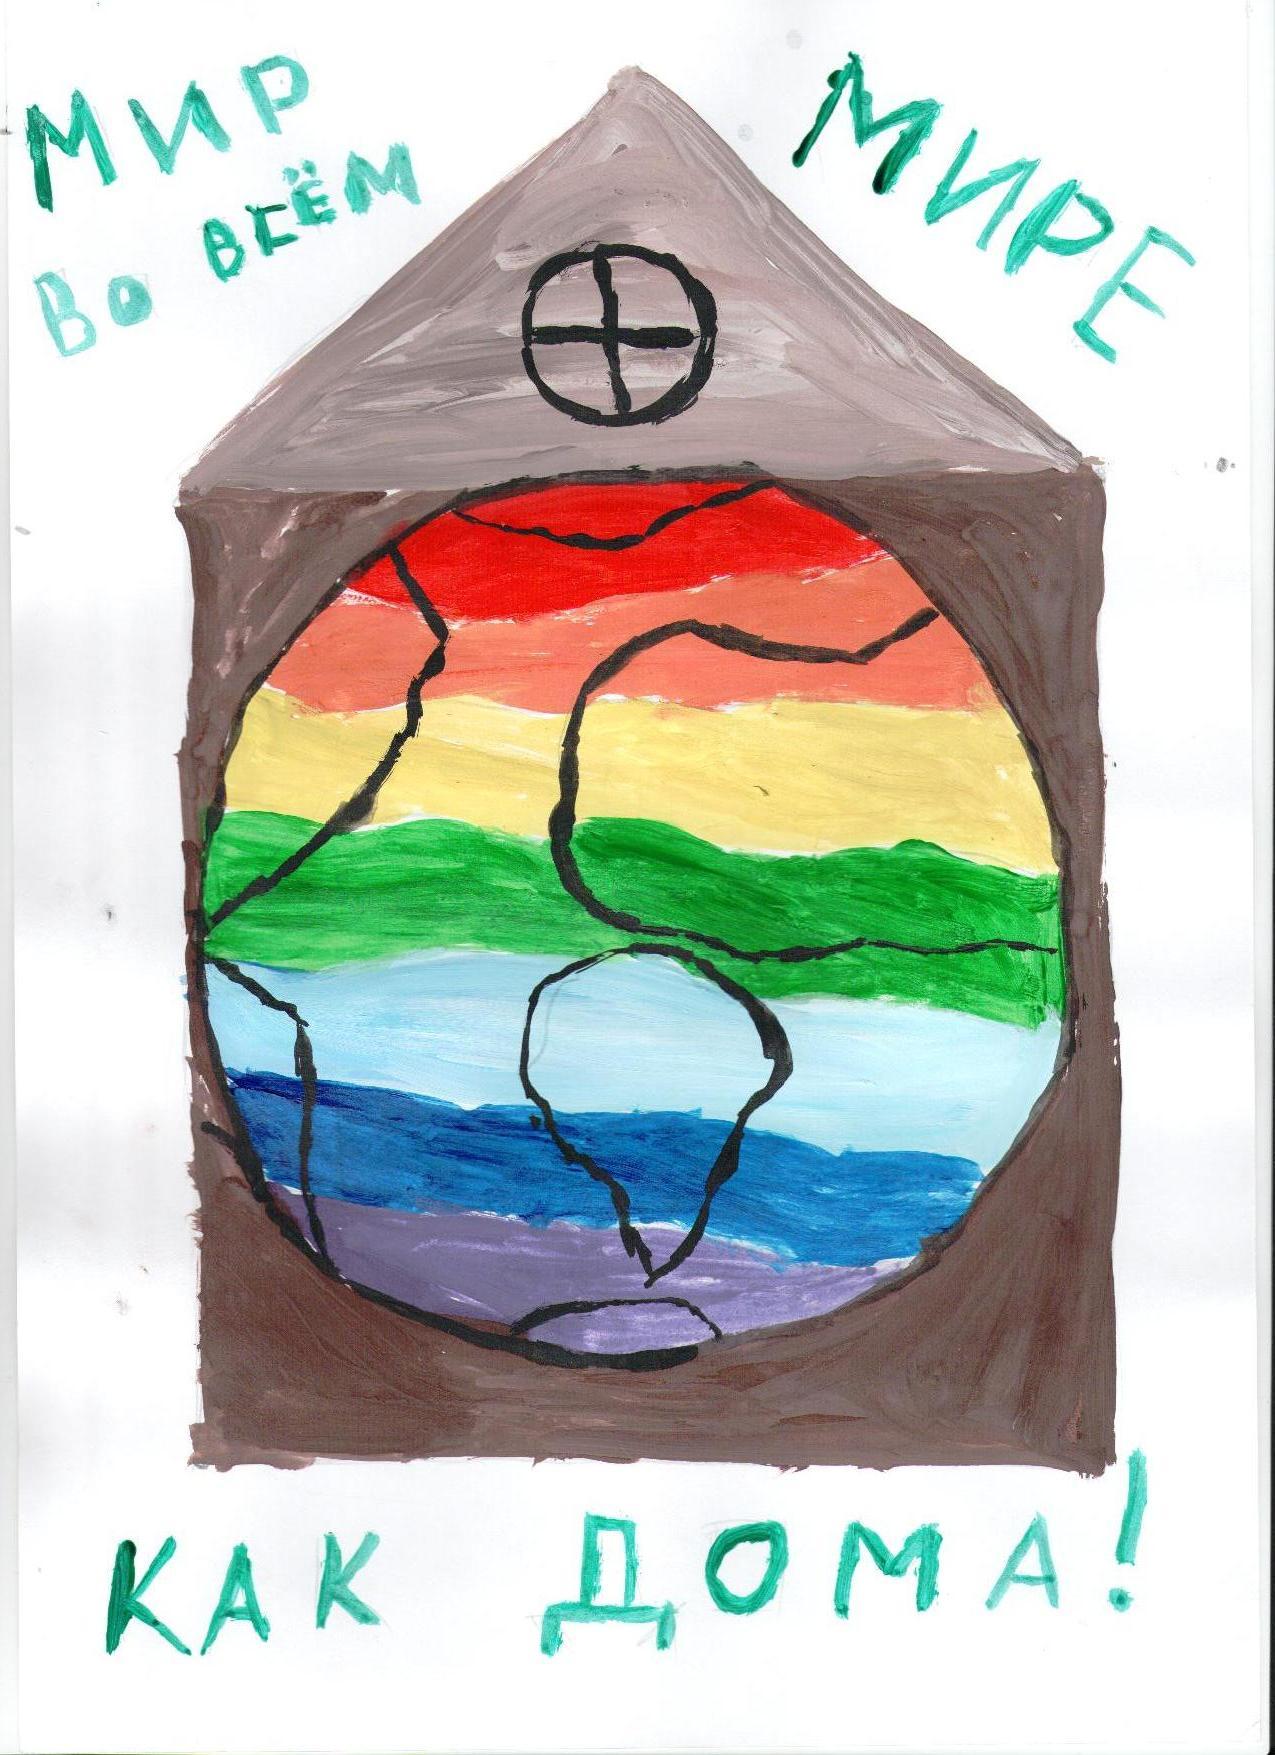 Картинки Мир за мир во всем мире   подборка фото (6)